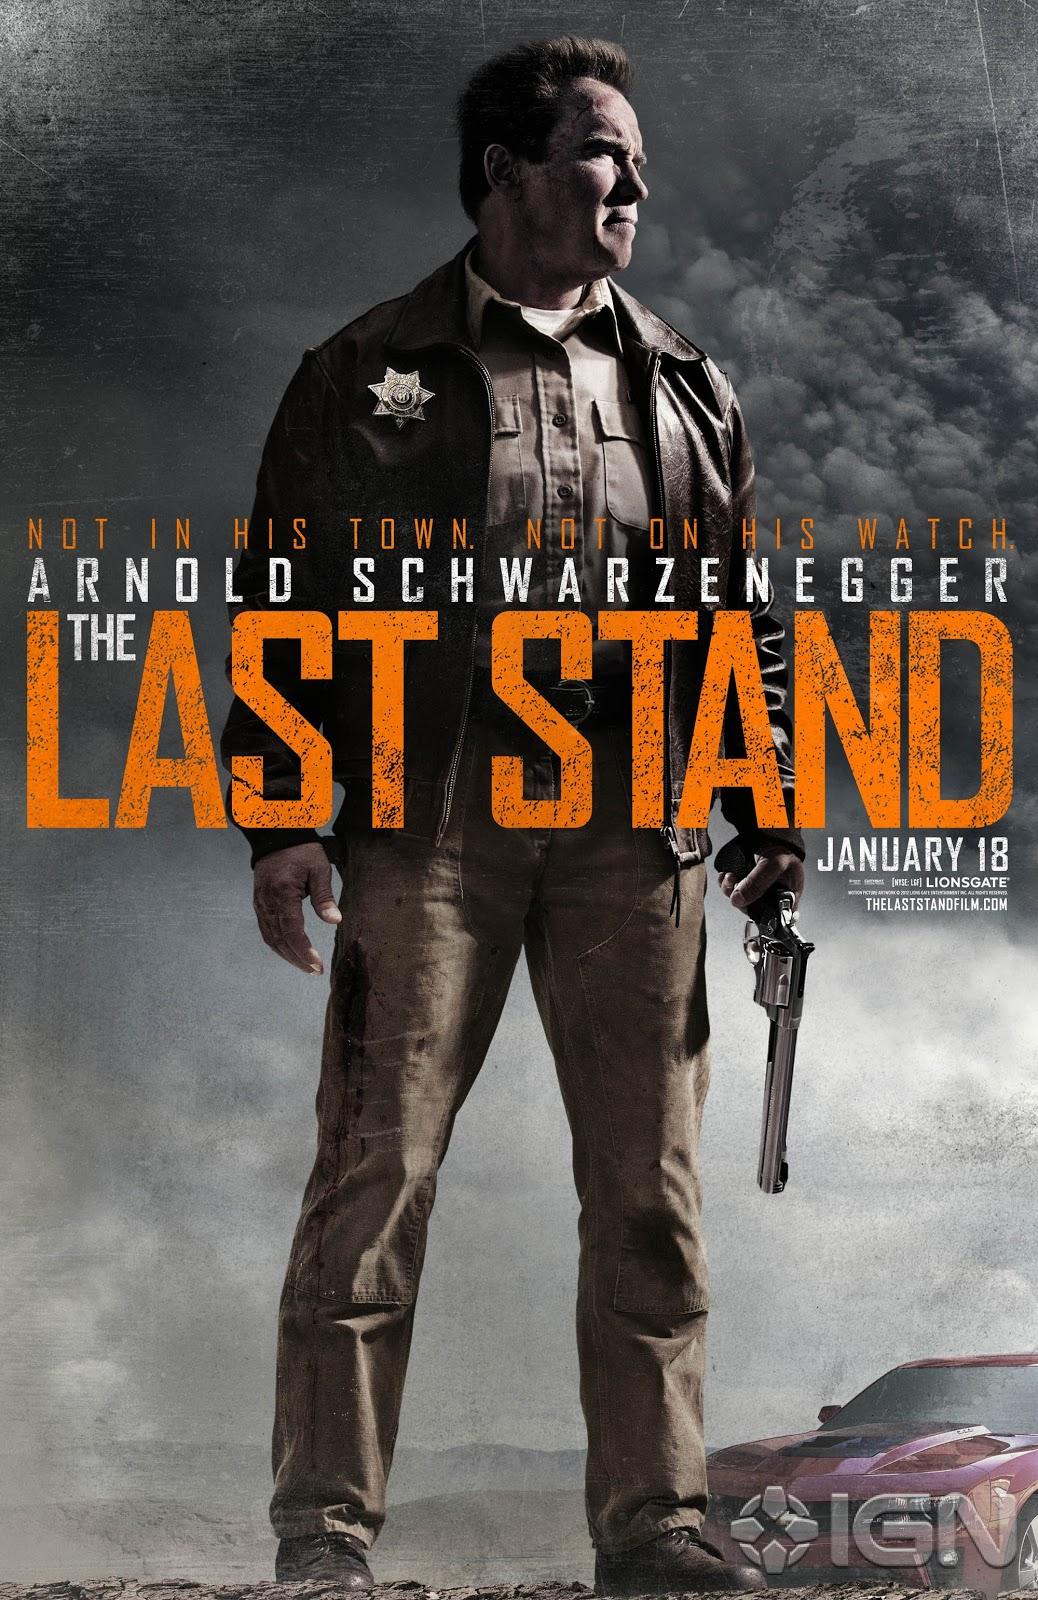 http://2.bp.blogspot.com/-wswbtKBfjNs/UOiYUrXO0-I/AAAAAAAADyA/BxqvuksukJ8/s1600/IGN-last-stand-poster.jpg